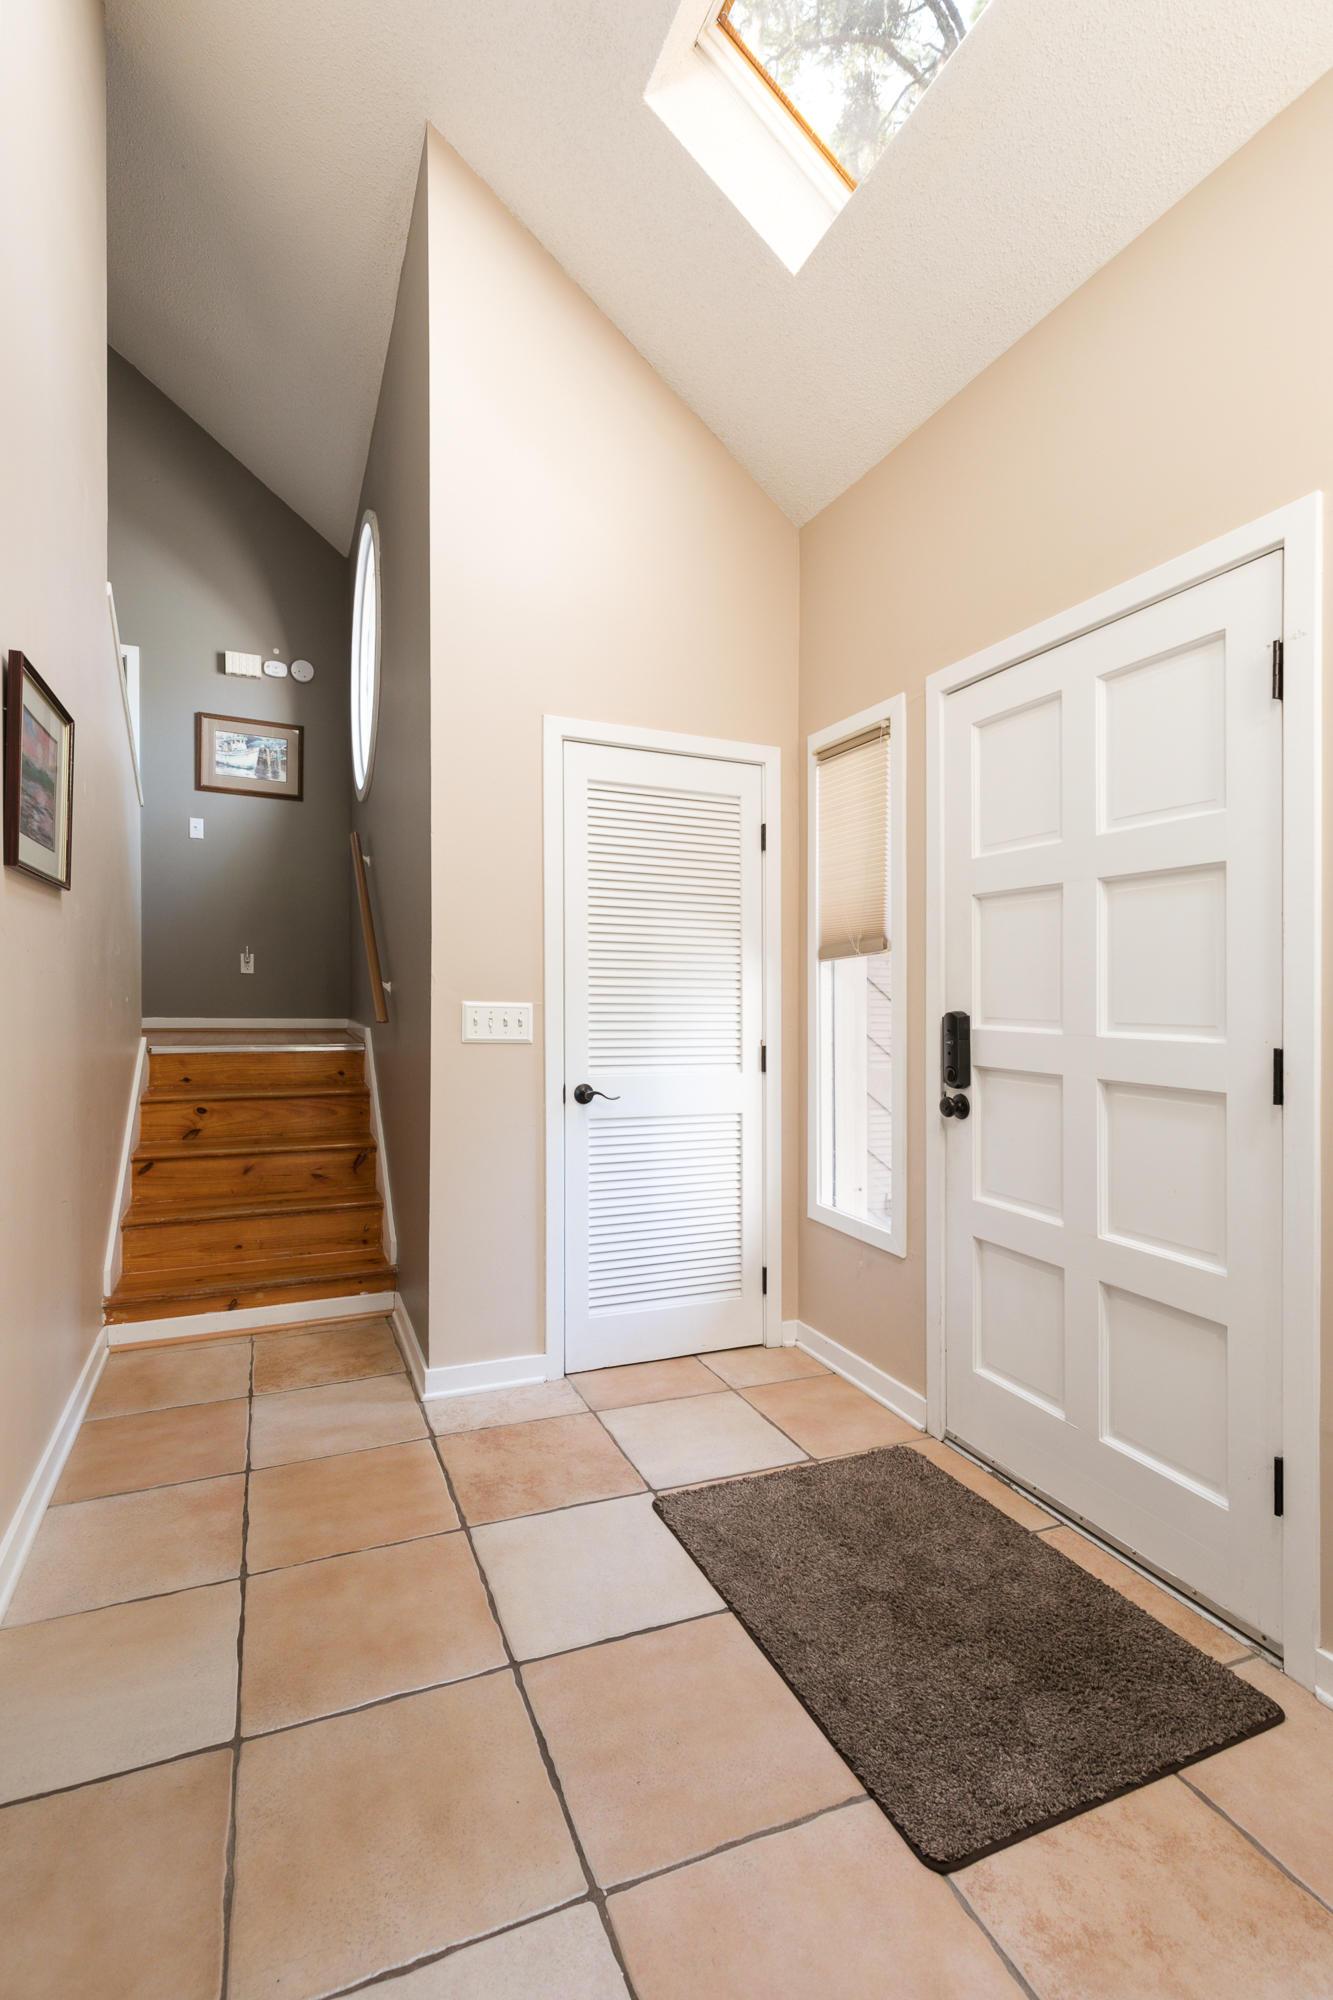 Seabrook Island Homes For Sale - 3080 Marshgate, Seabrook Island, SC - 44